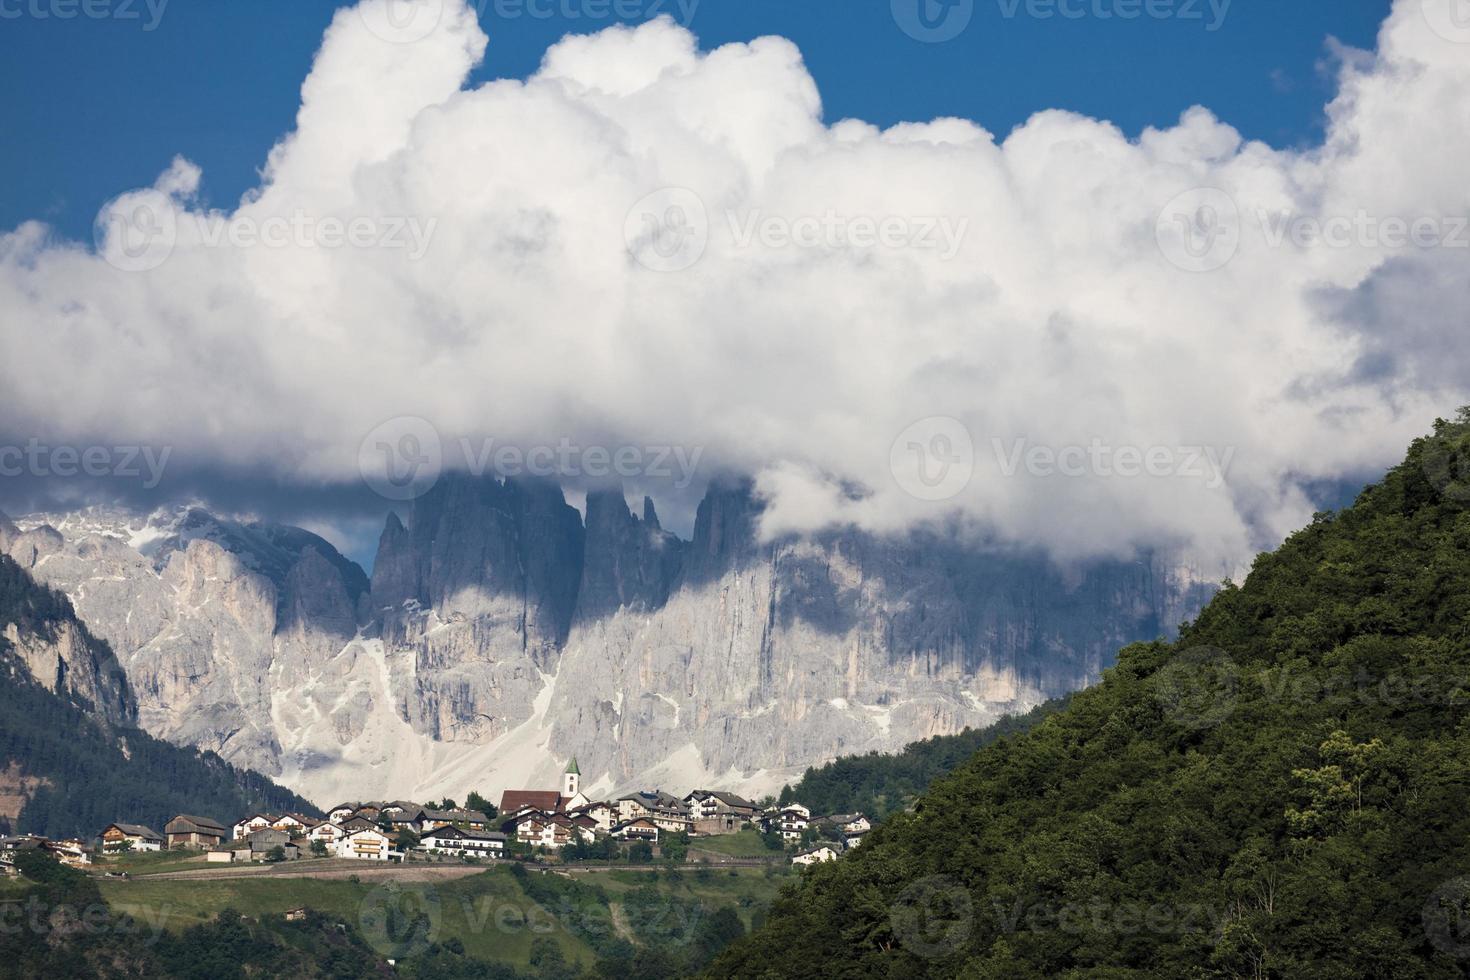 Italy, South Tyrol, Landscape, Mountain village photo